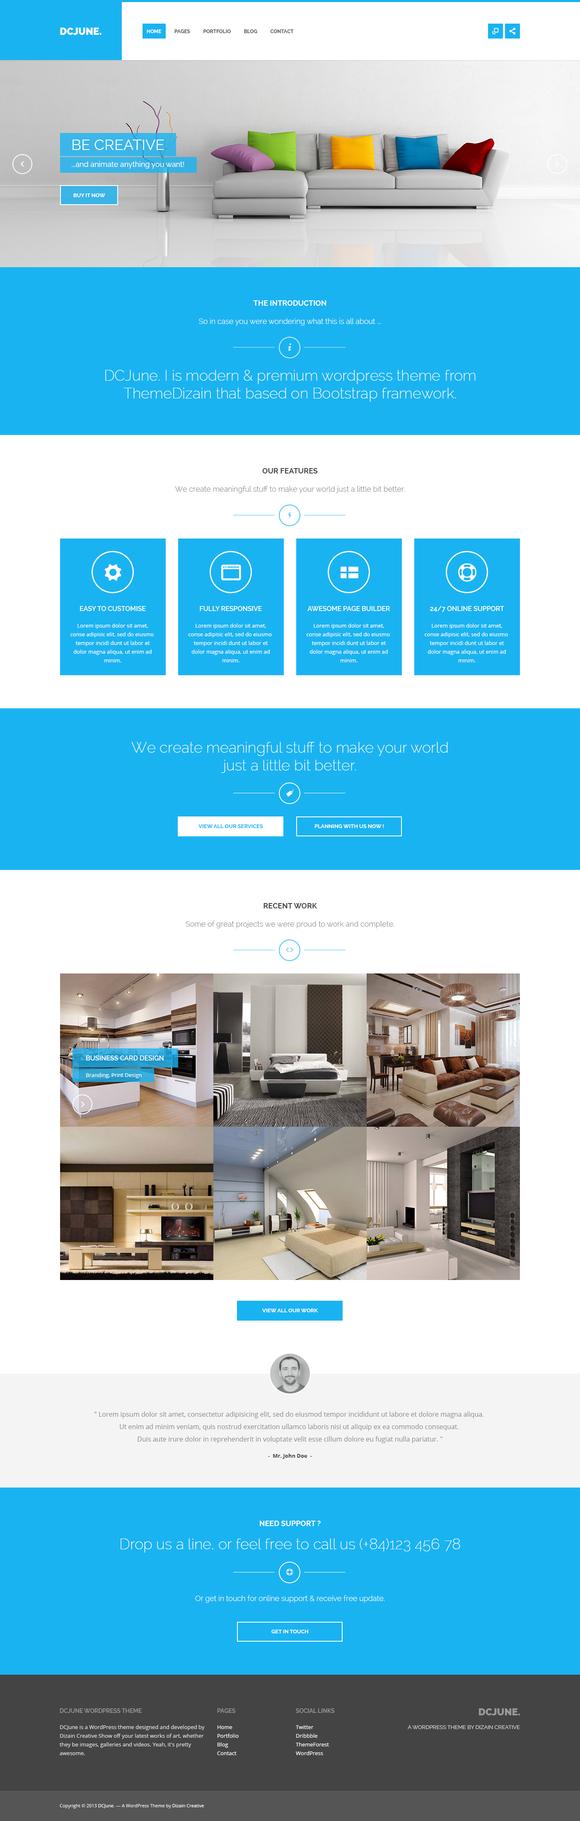 DPJuly – Responsive WordPress Theme ~ WordPress Themes  Free Download